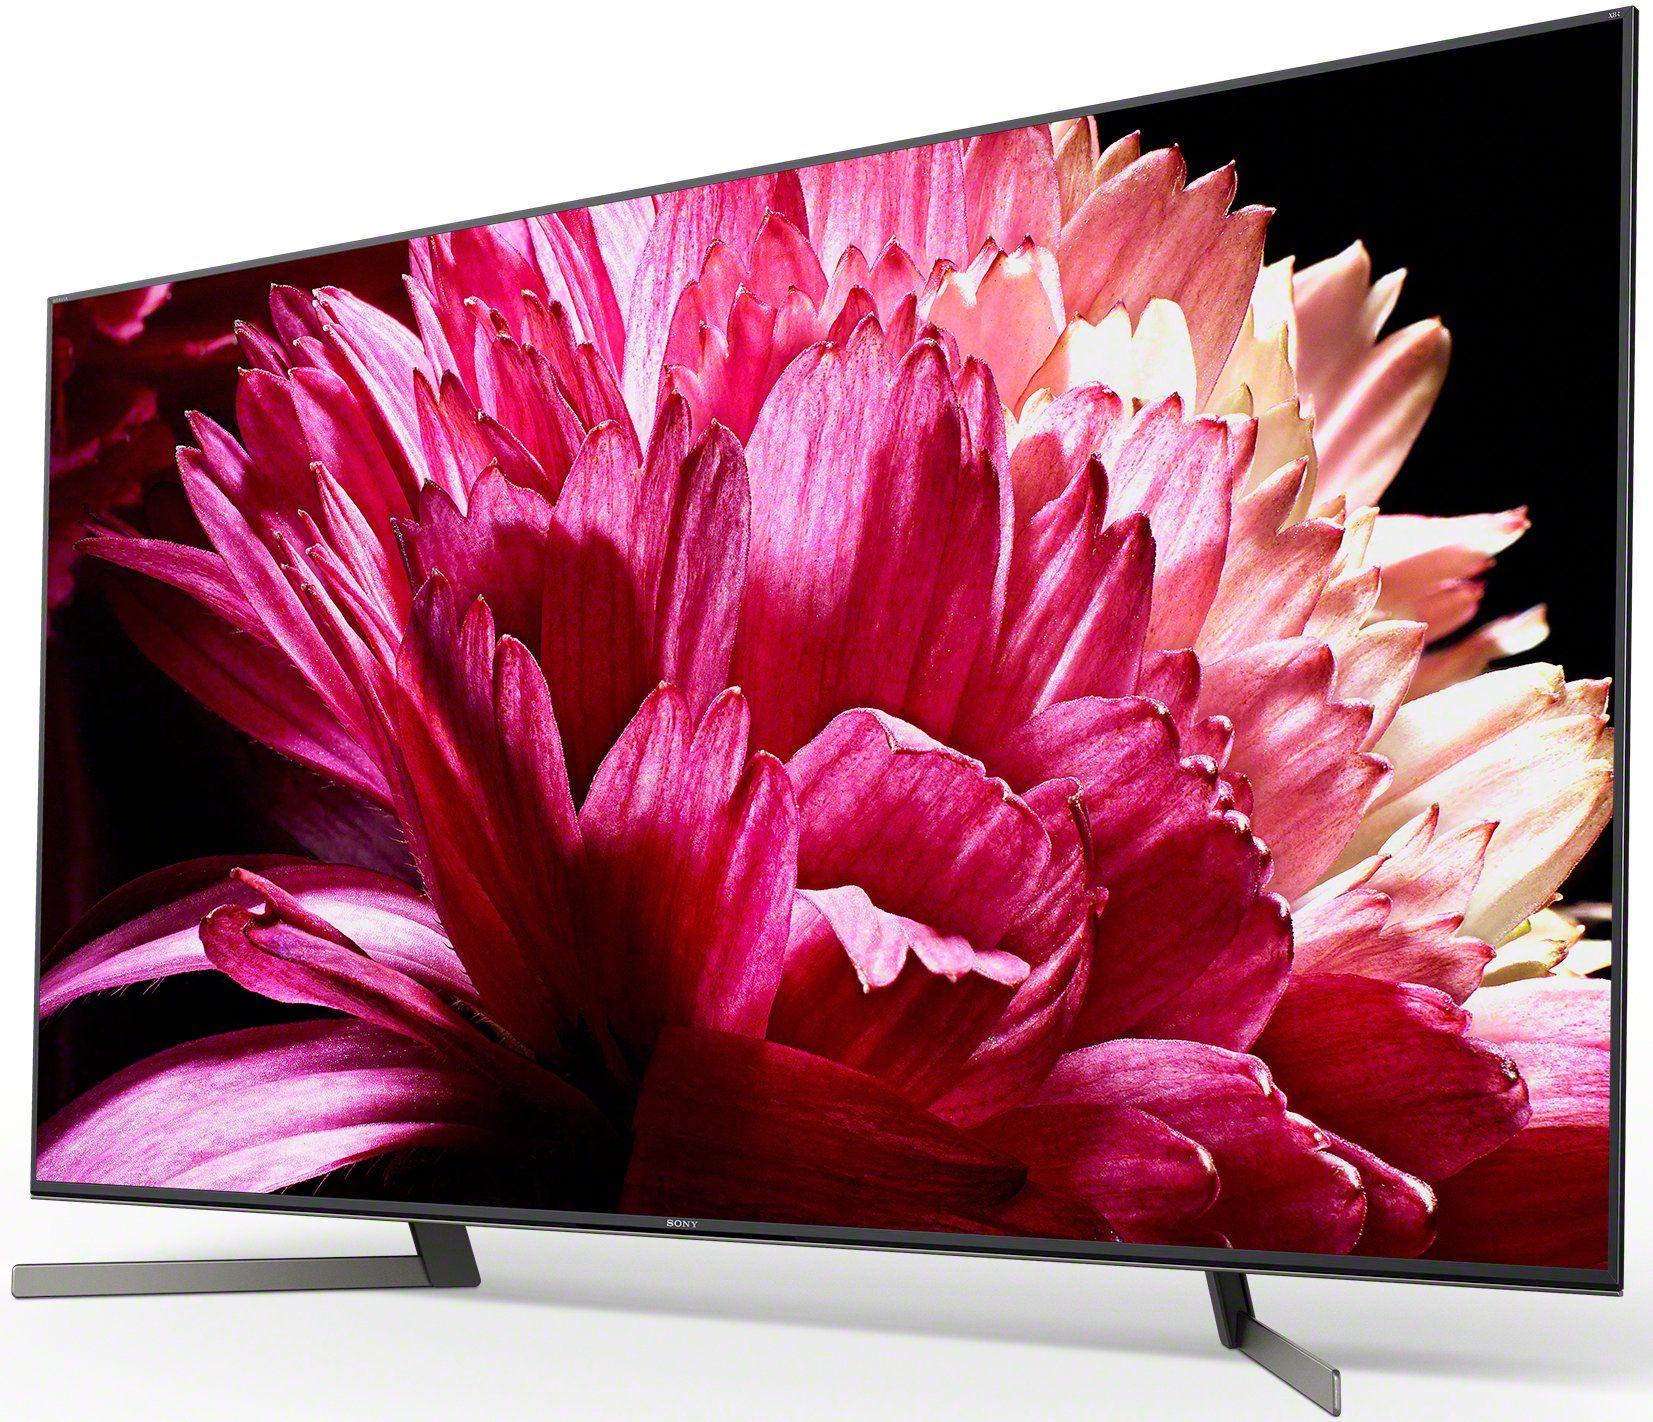 Sony Bravia Smart Tv X950g 55 Inch 4k Hdr Ultra Hd Led Sony Xbr